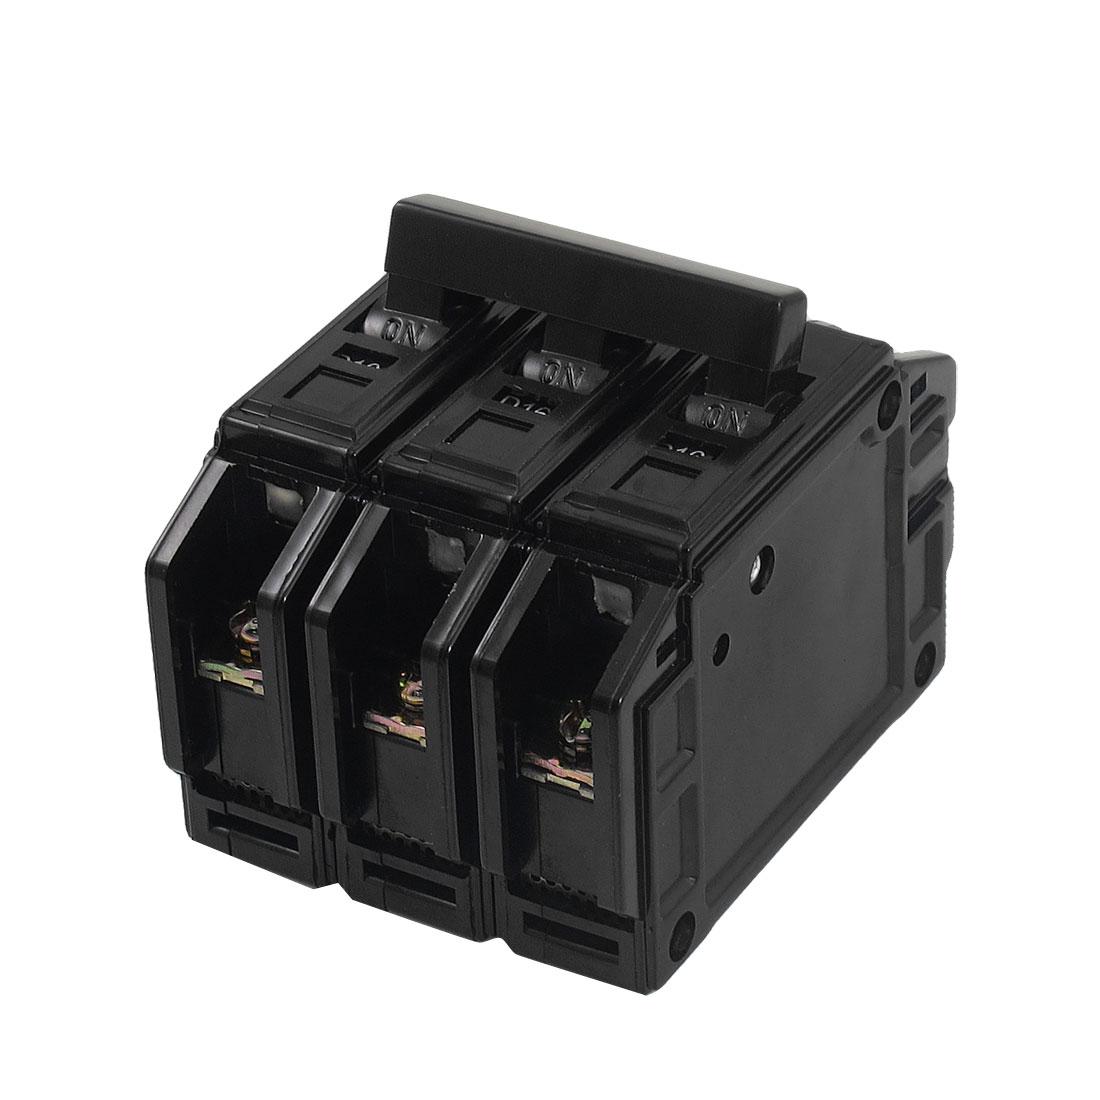 AC 220V/380V 16A Three Poles 3P MCCB Moulded Case Circuit Breaker